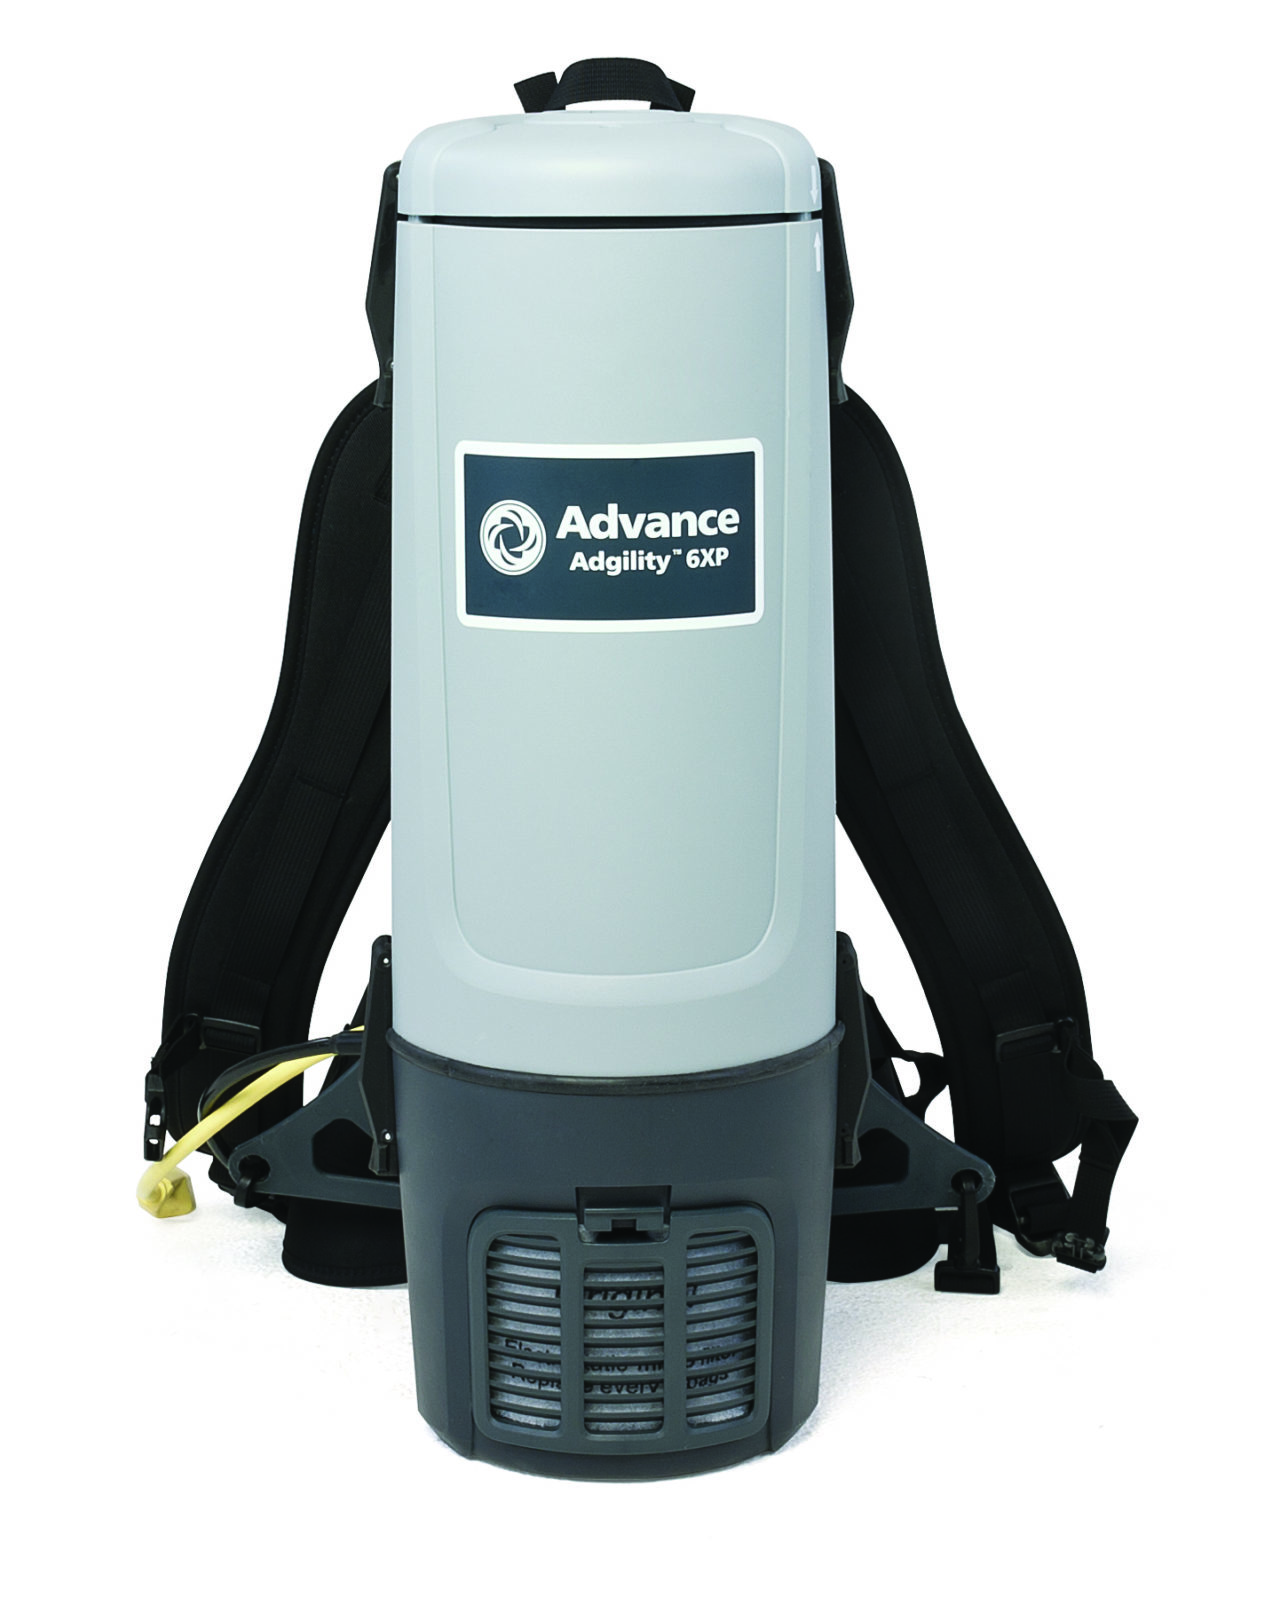 Aspirateur Adgility 6XP